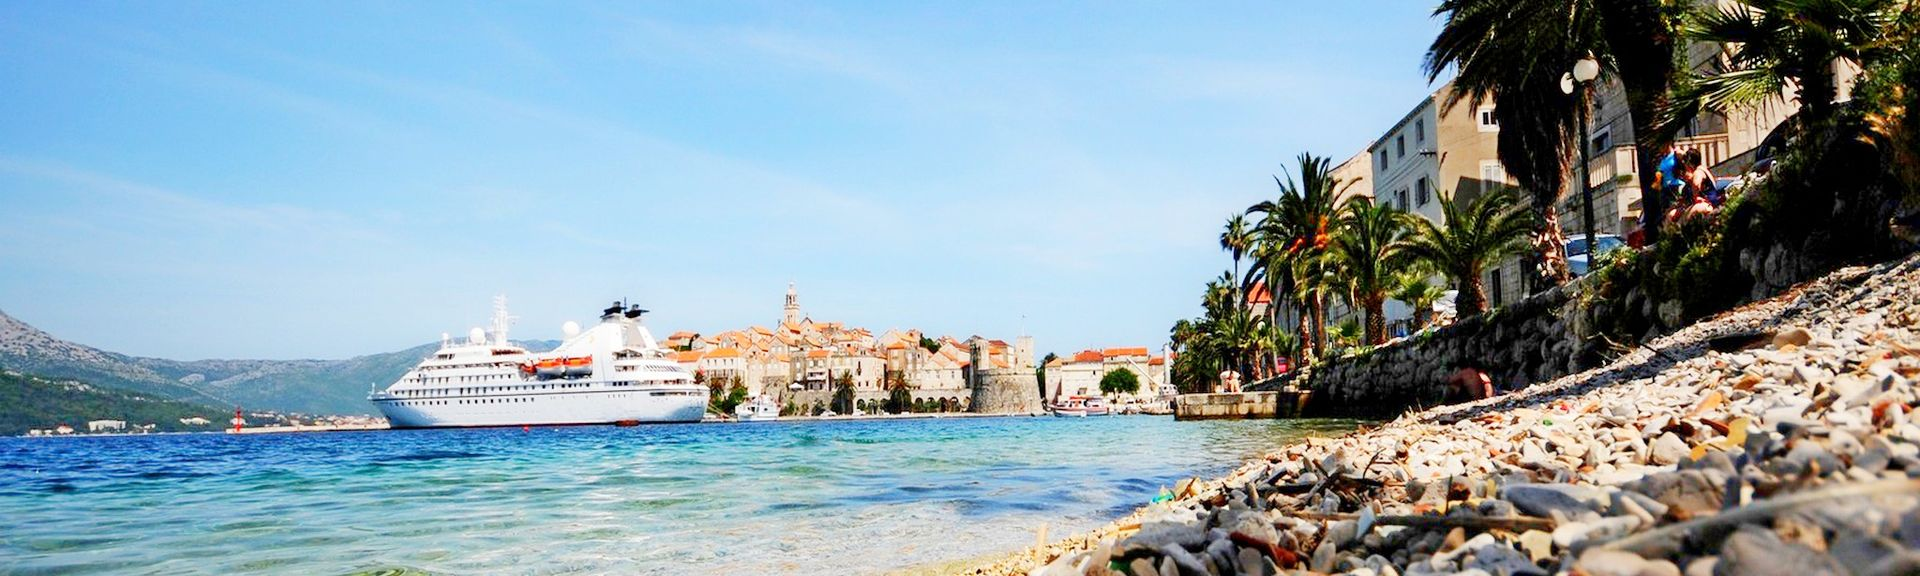 Vieille ville de Korčula, Korčula, Comitat de Dubrovnik-Neretva, Croatie